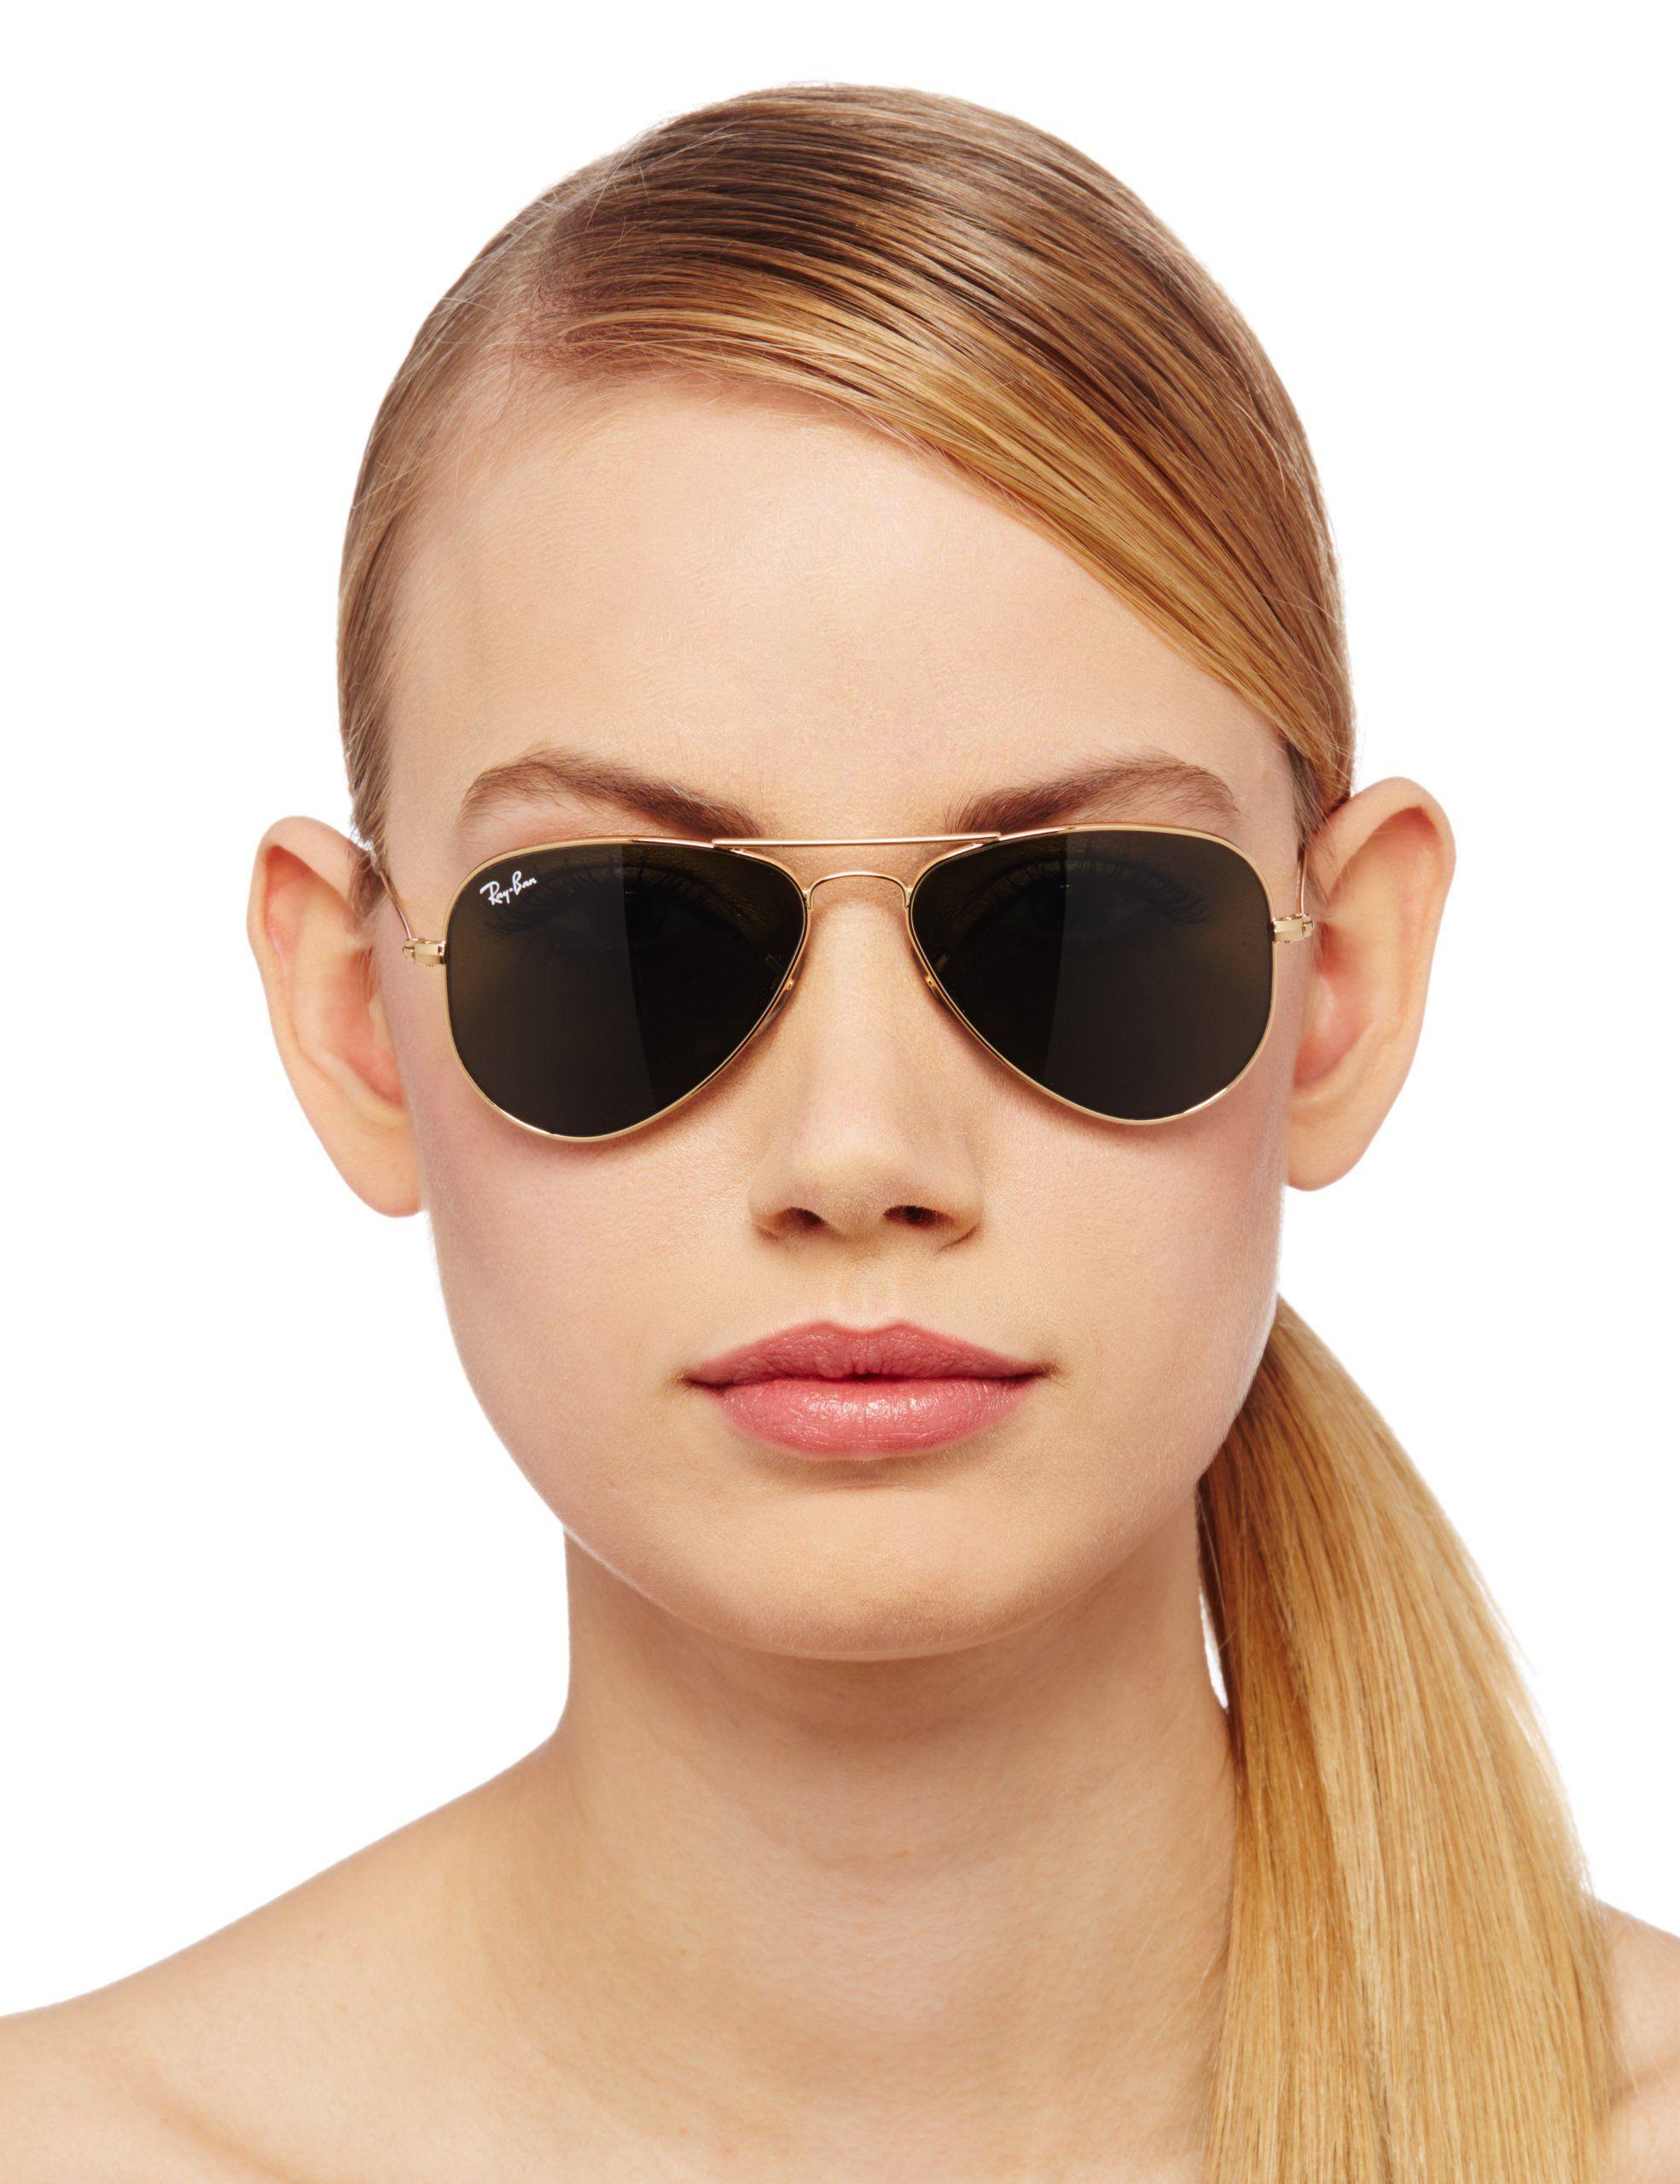 Ray-Ban Aviator Sunglasses,Arista Frame/Green Lens, For small face.